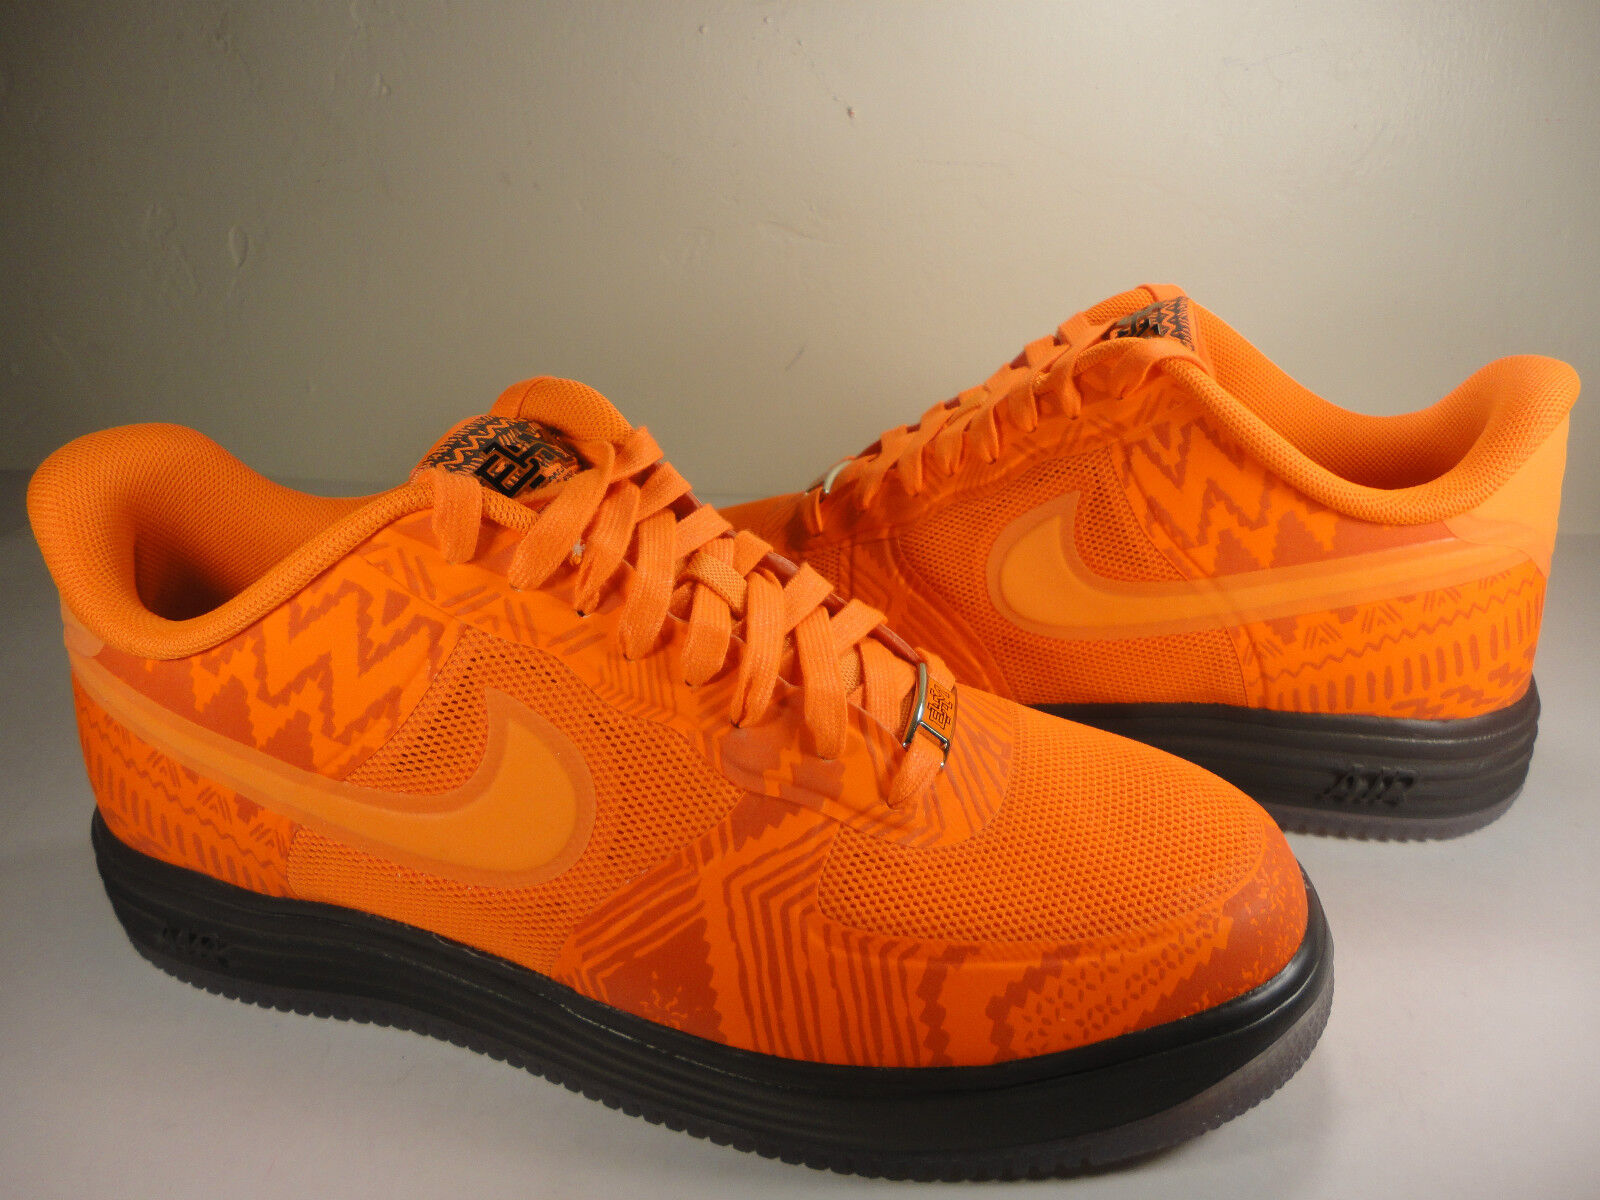 Nike Lunar Force 1 Fuse BHM Orange Black History QS Brown SZ 9.5 (585714-800)